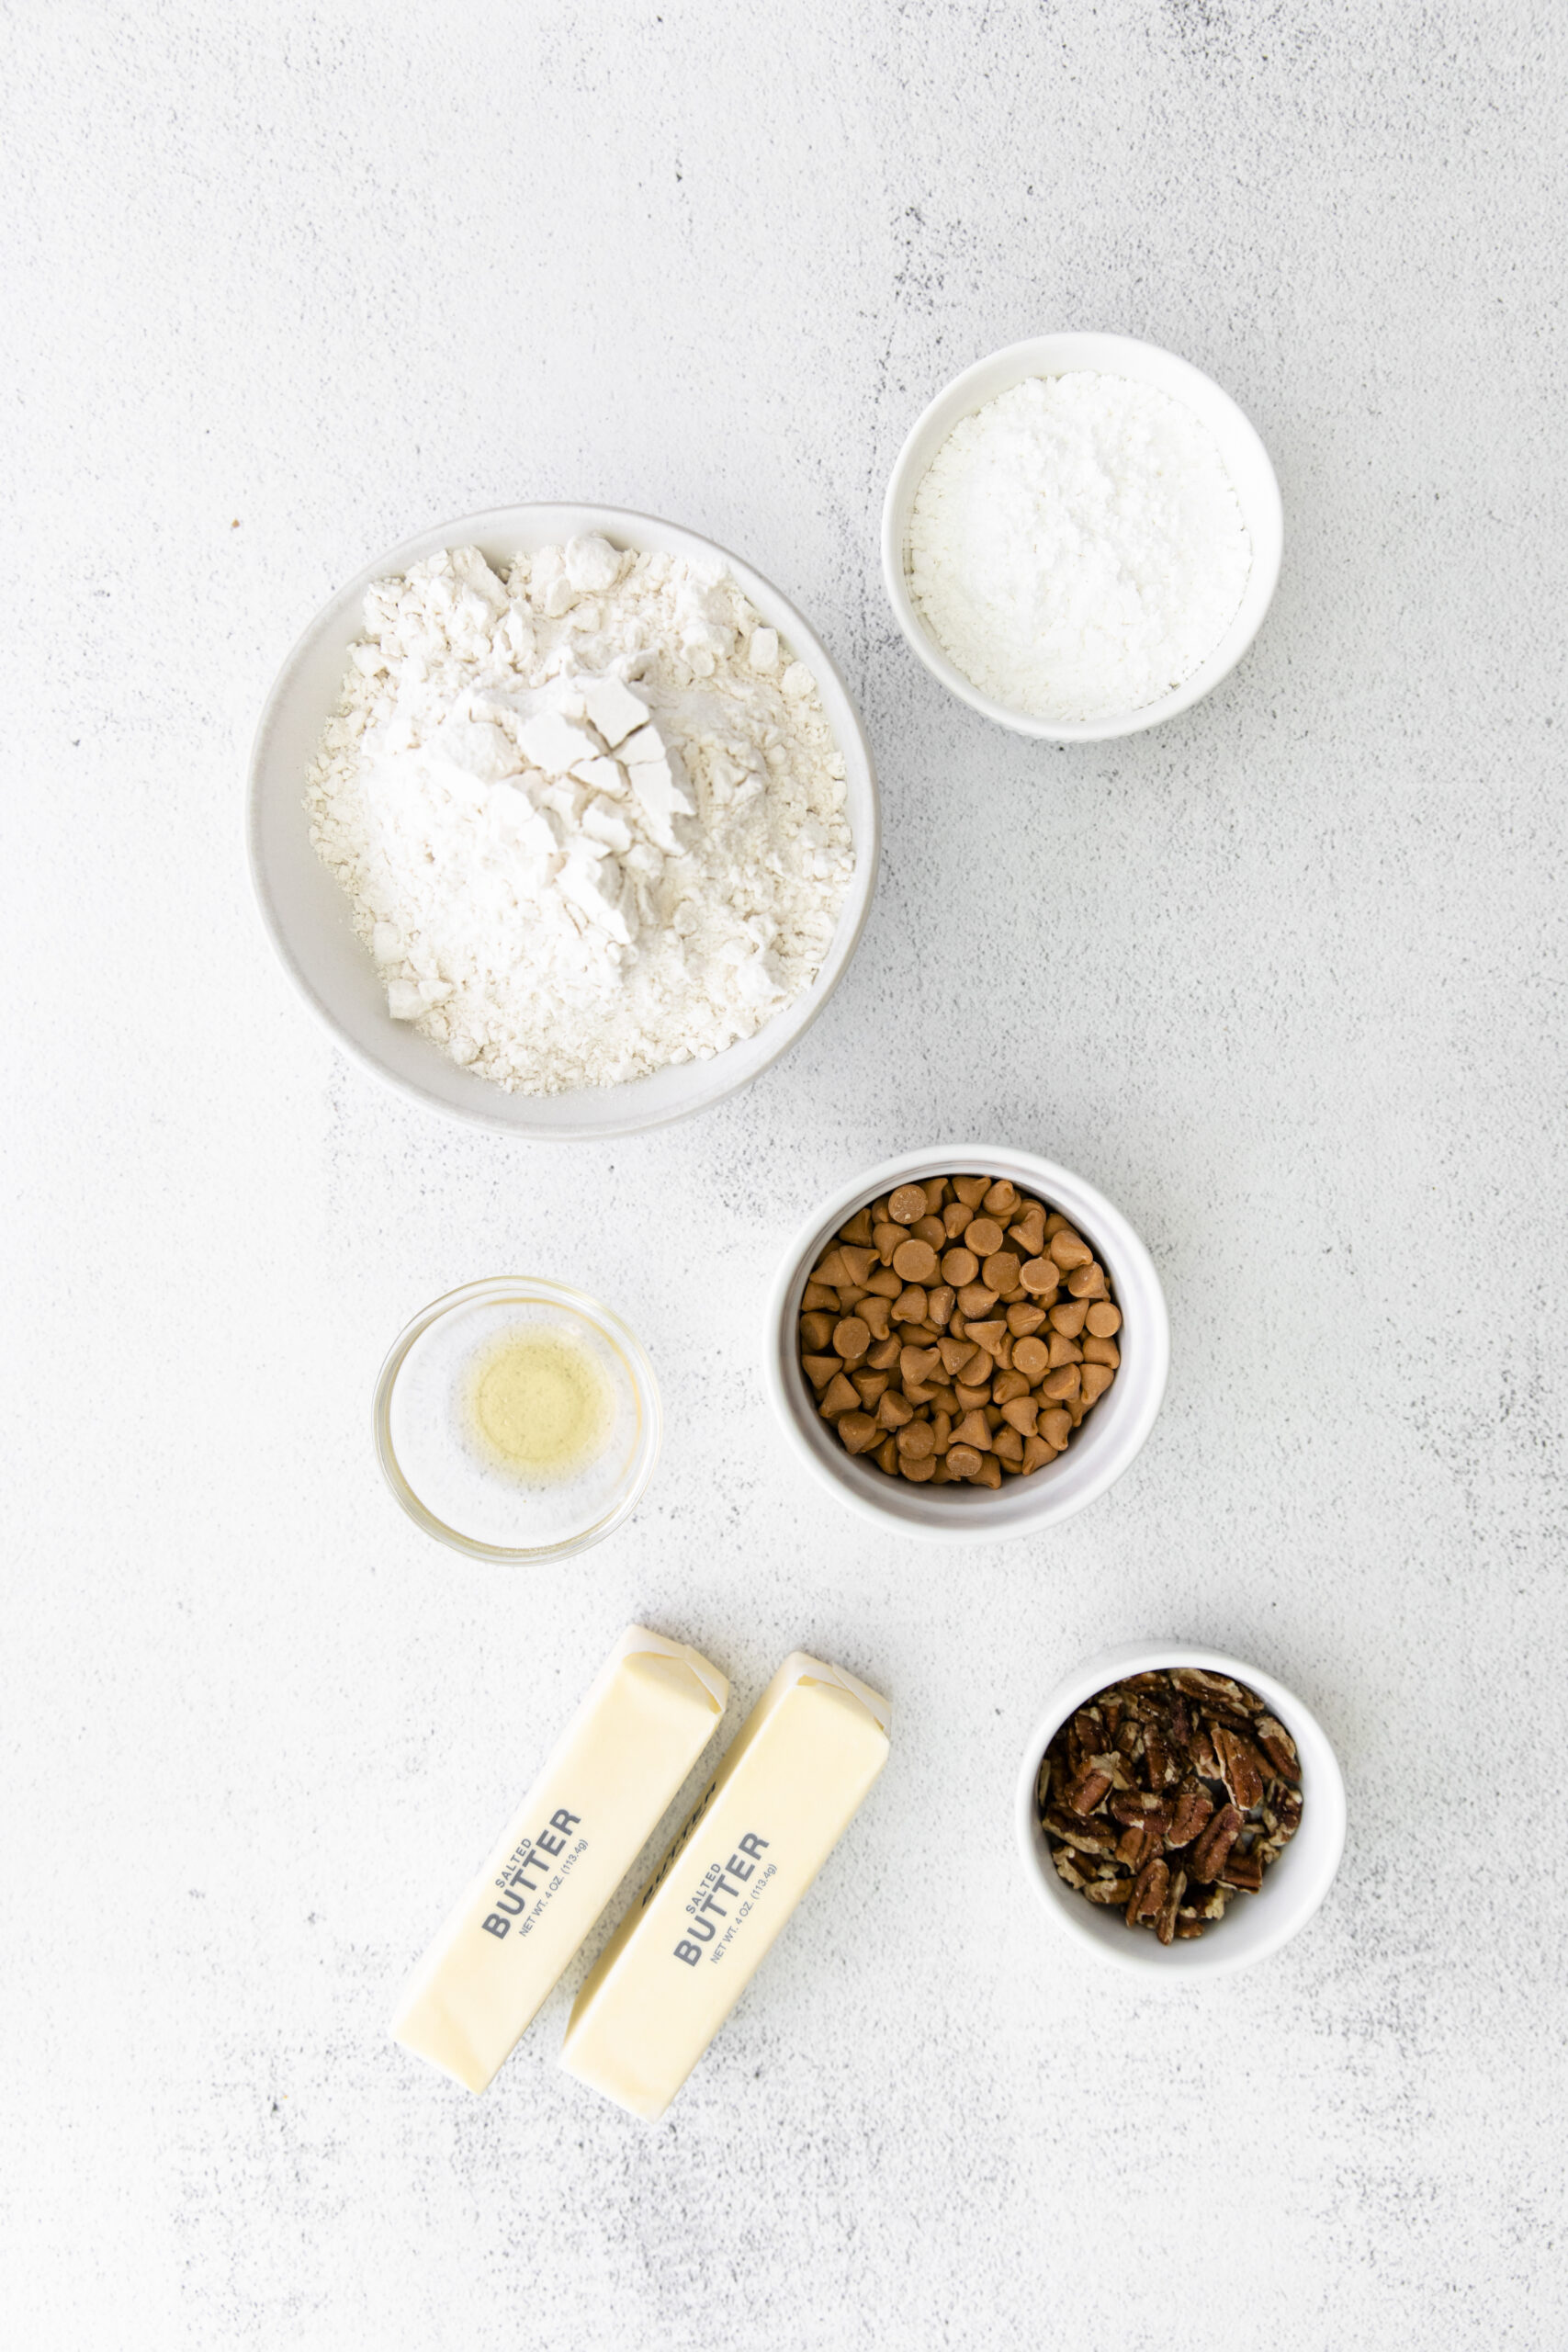 ingredients for butterscotch shortbread cookies